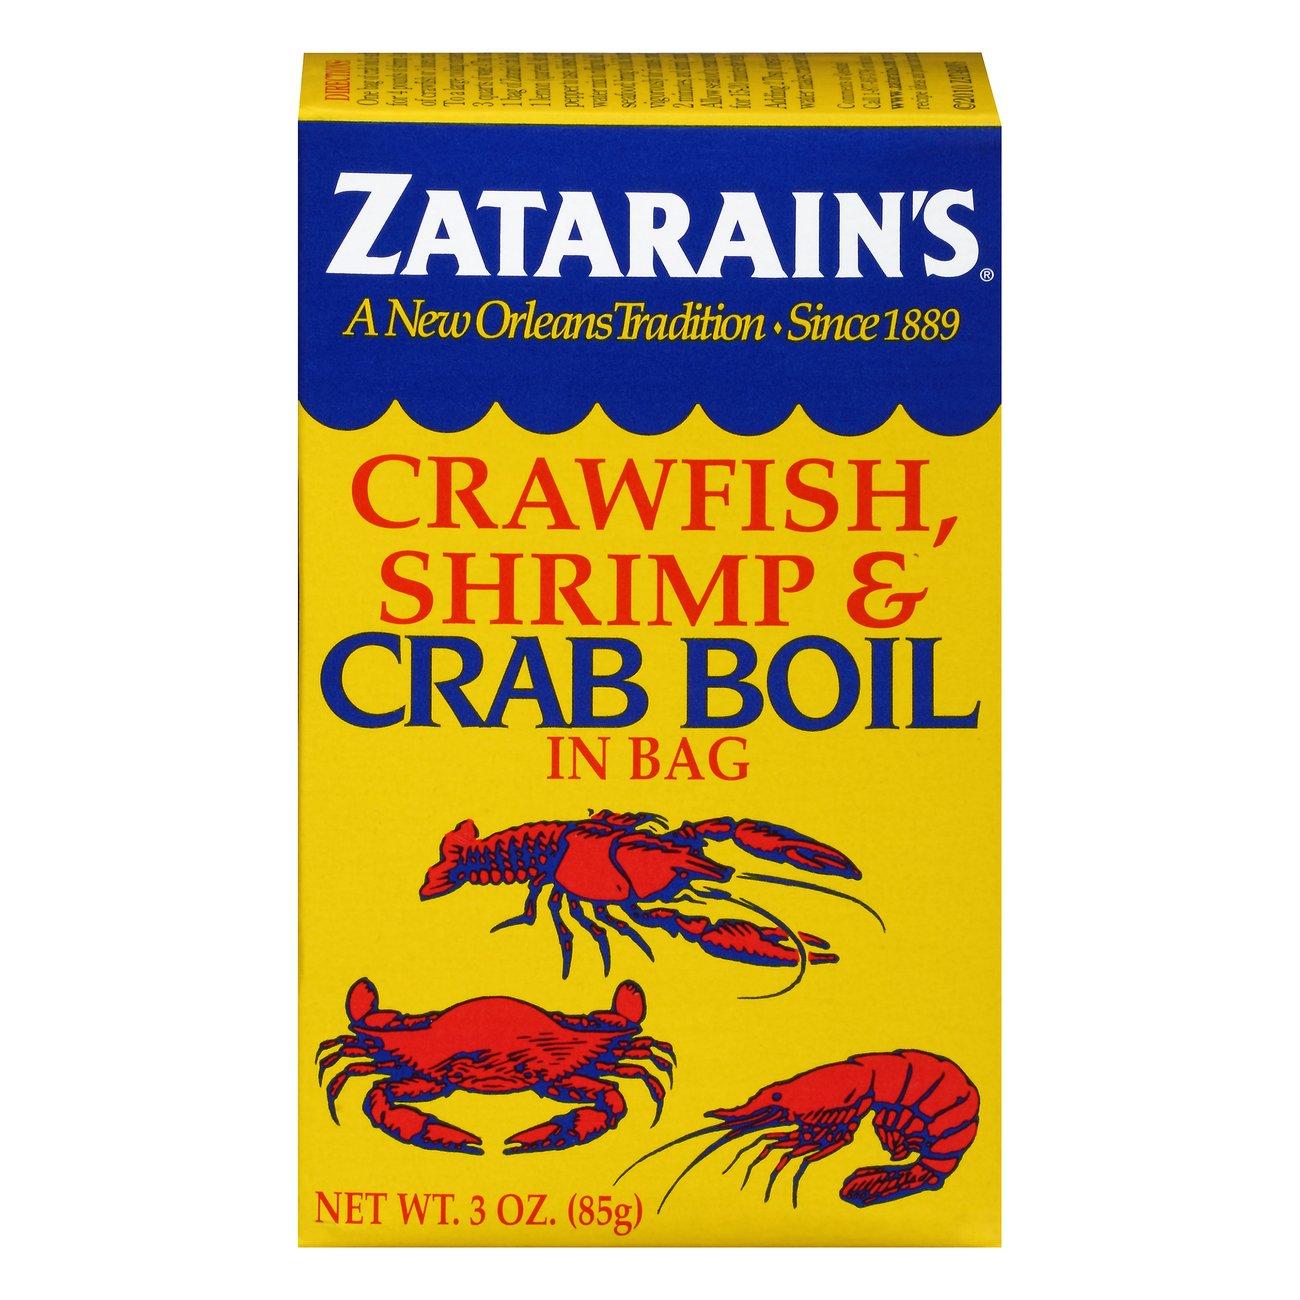 Zatarain S Crawfish Shrimp Crab Boil In Bag Shop Spice Mixes